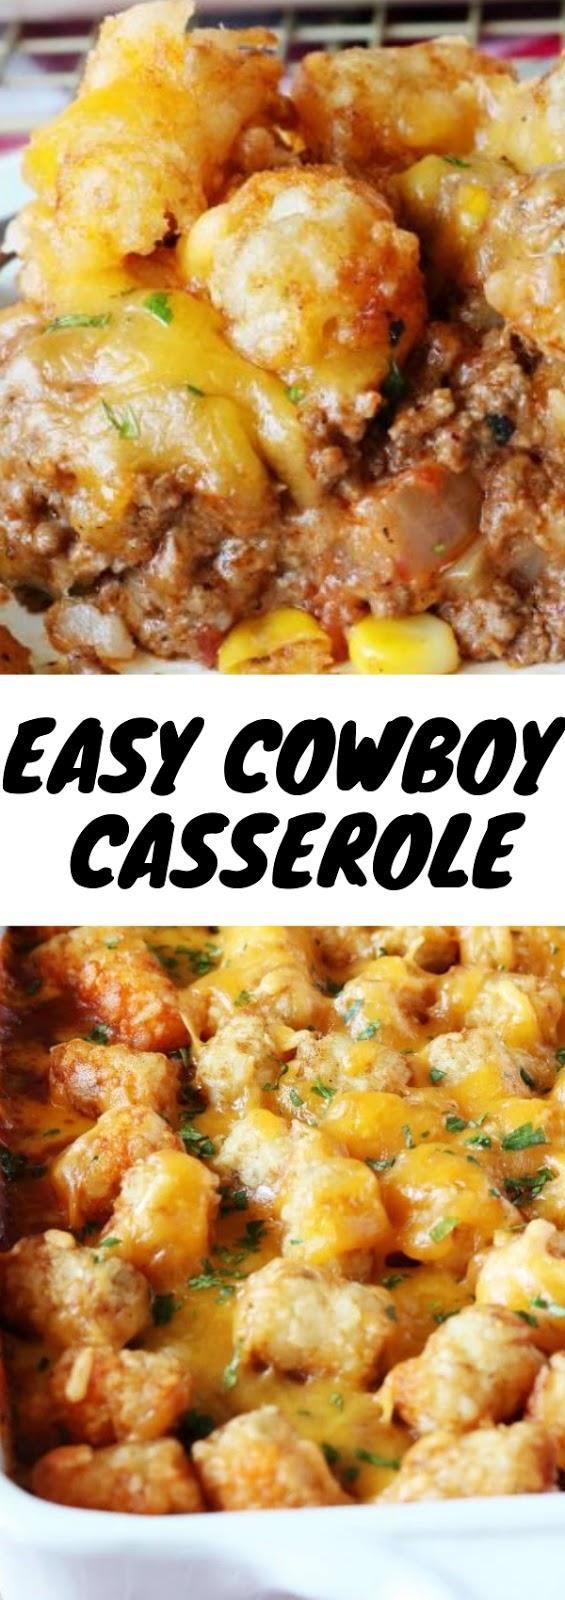 Easy Cowboy Casserole #dinner #american #dietfood #easy #cowboy #casserole